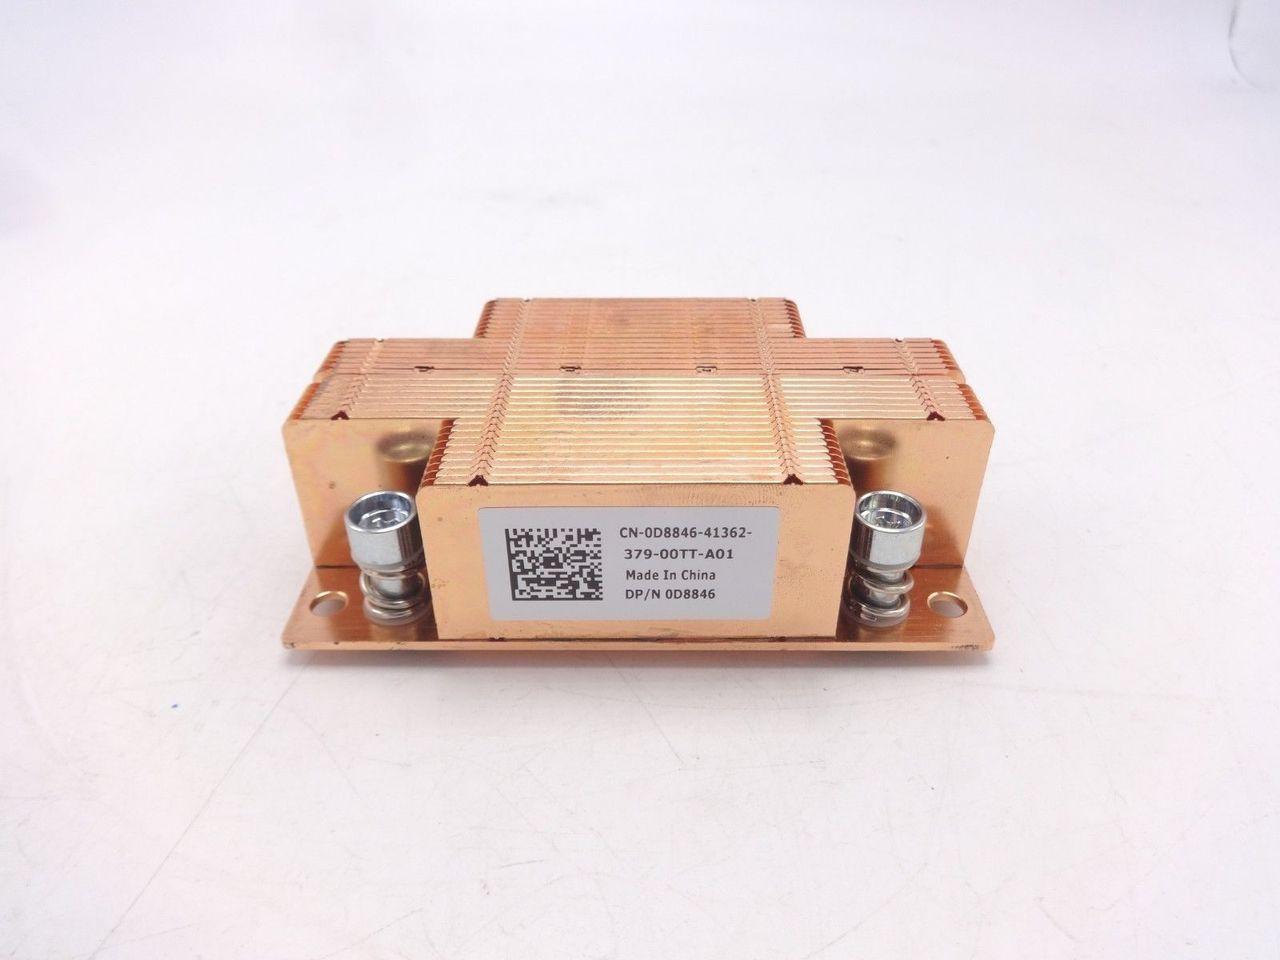 Dell D8846 Poweredge M620 Heatsink